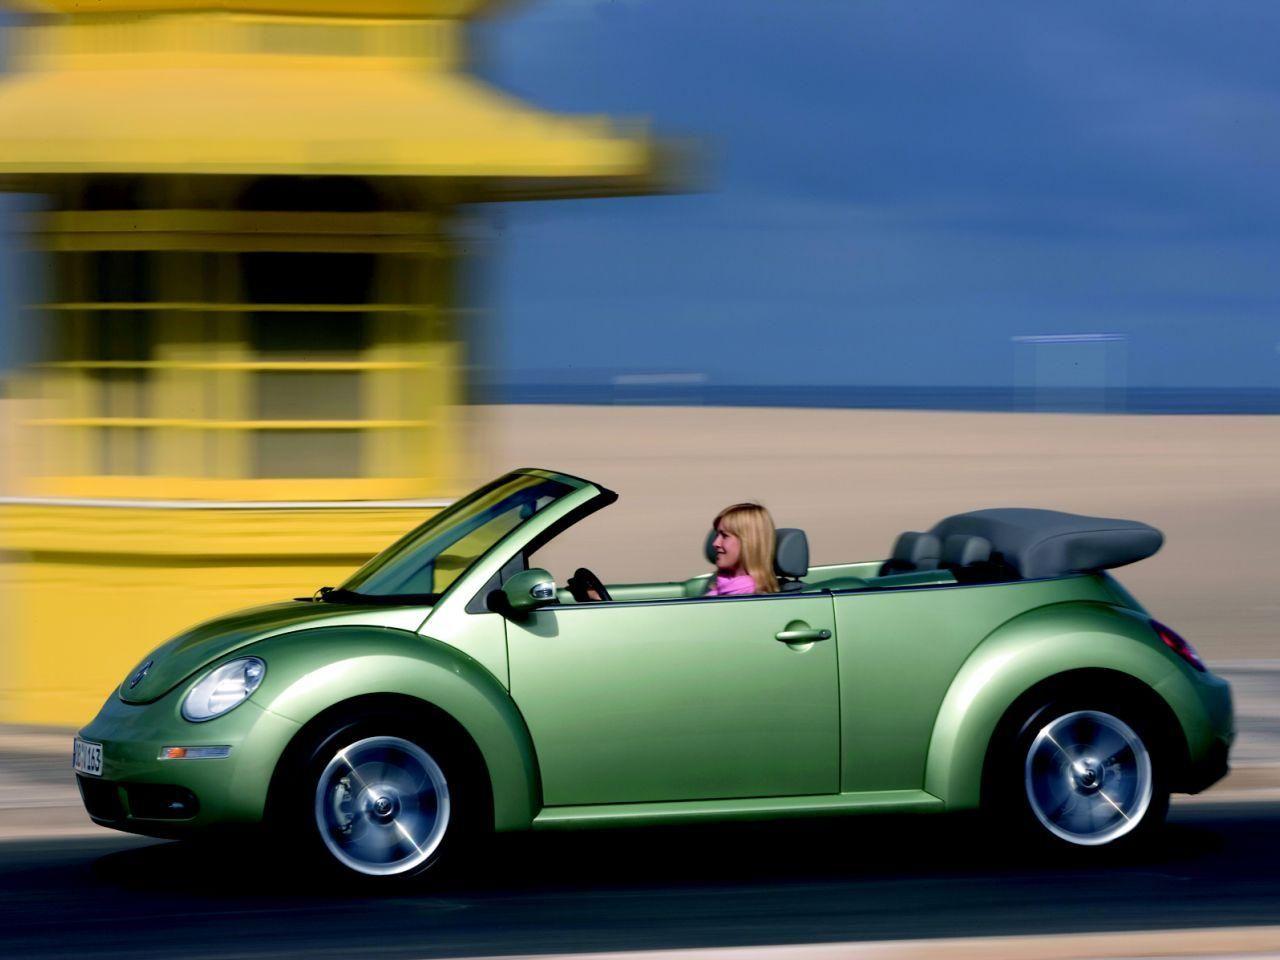 Superb Volkswagen Beetle Cabriolet   My Fantasy Car, For My Fantasy Beach Life : )  Itu0027s Soo Cute! | Wishing For... | Pinterest | Beetles And Volkswagen